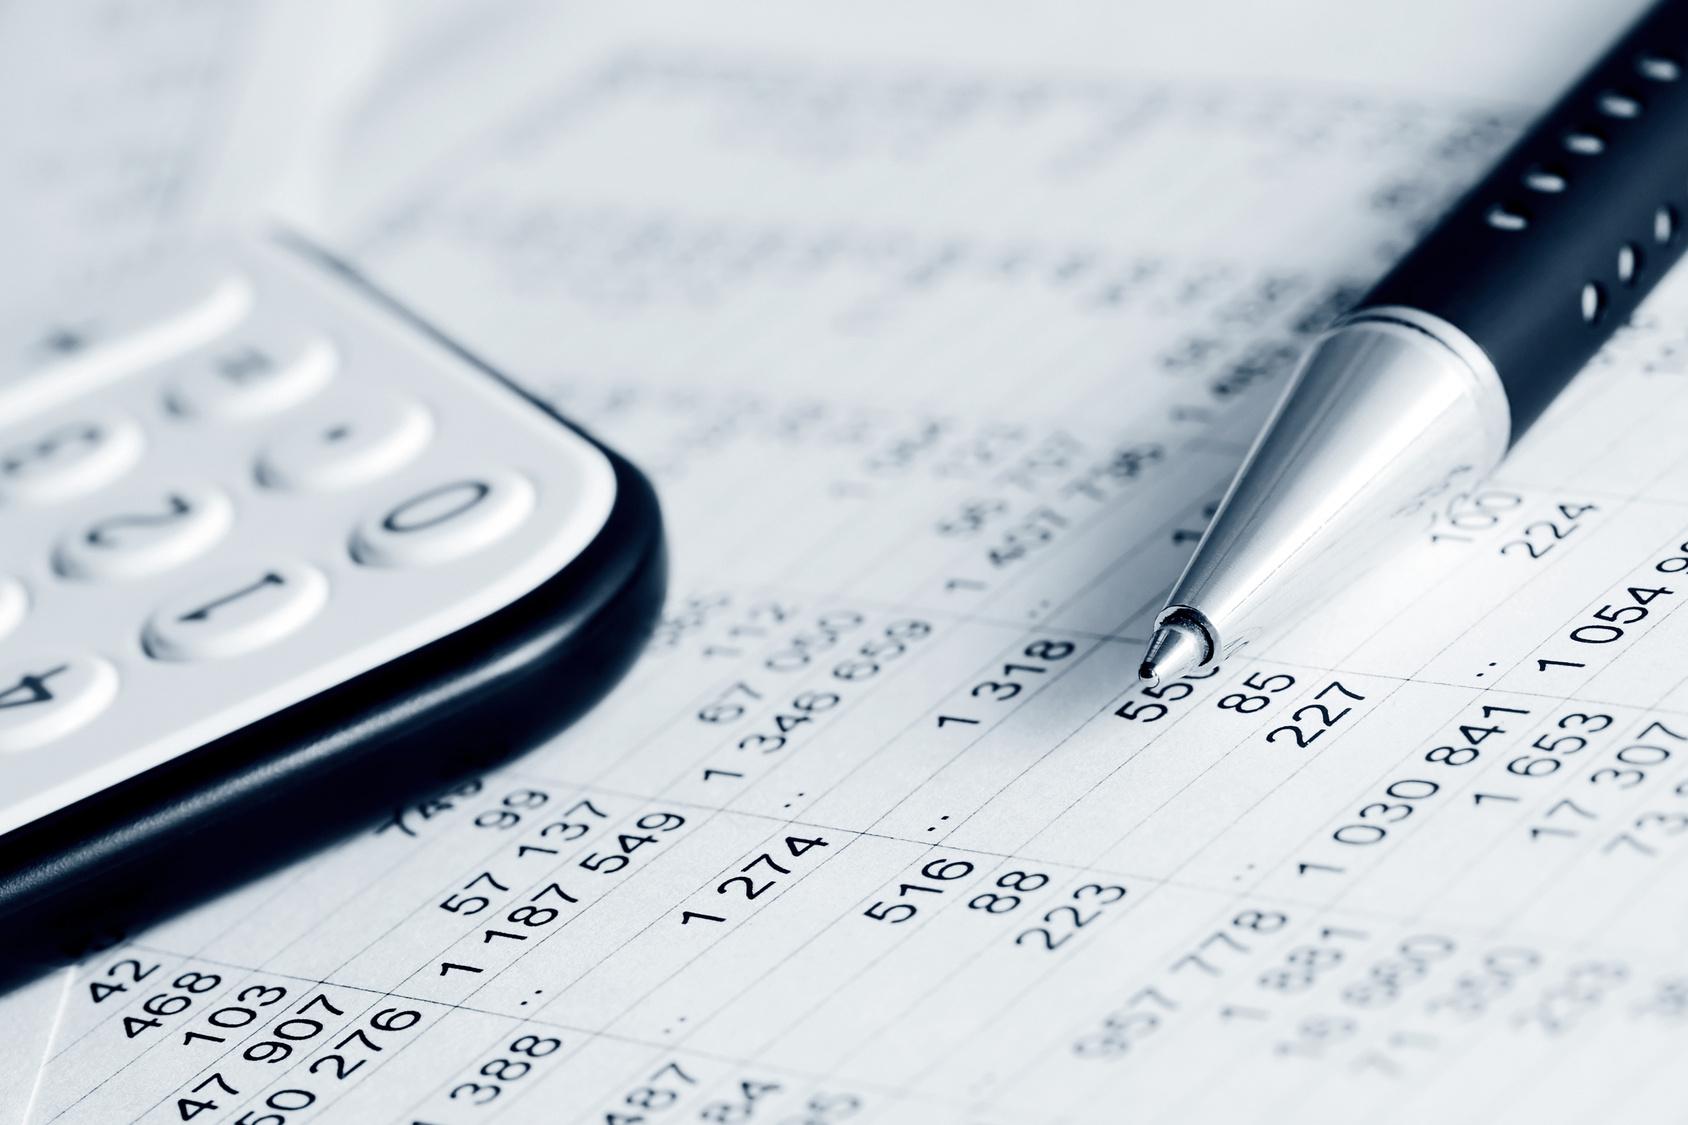 financial_accounting_spreadsheet_calculator